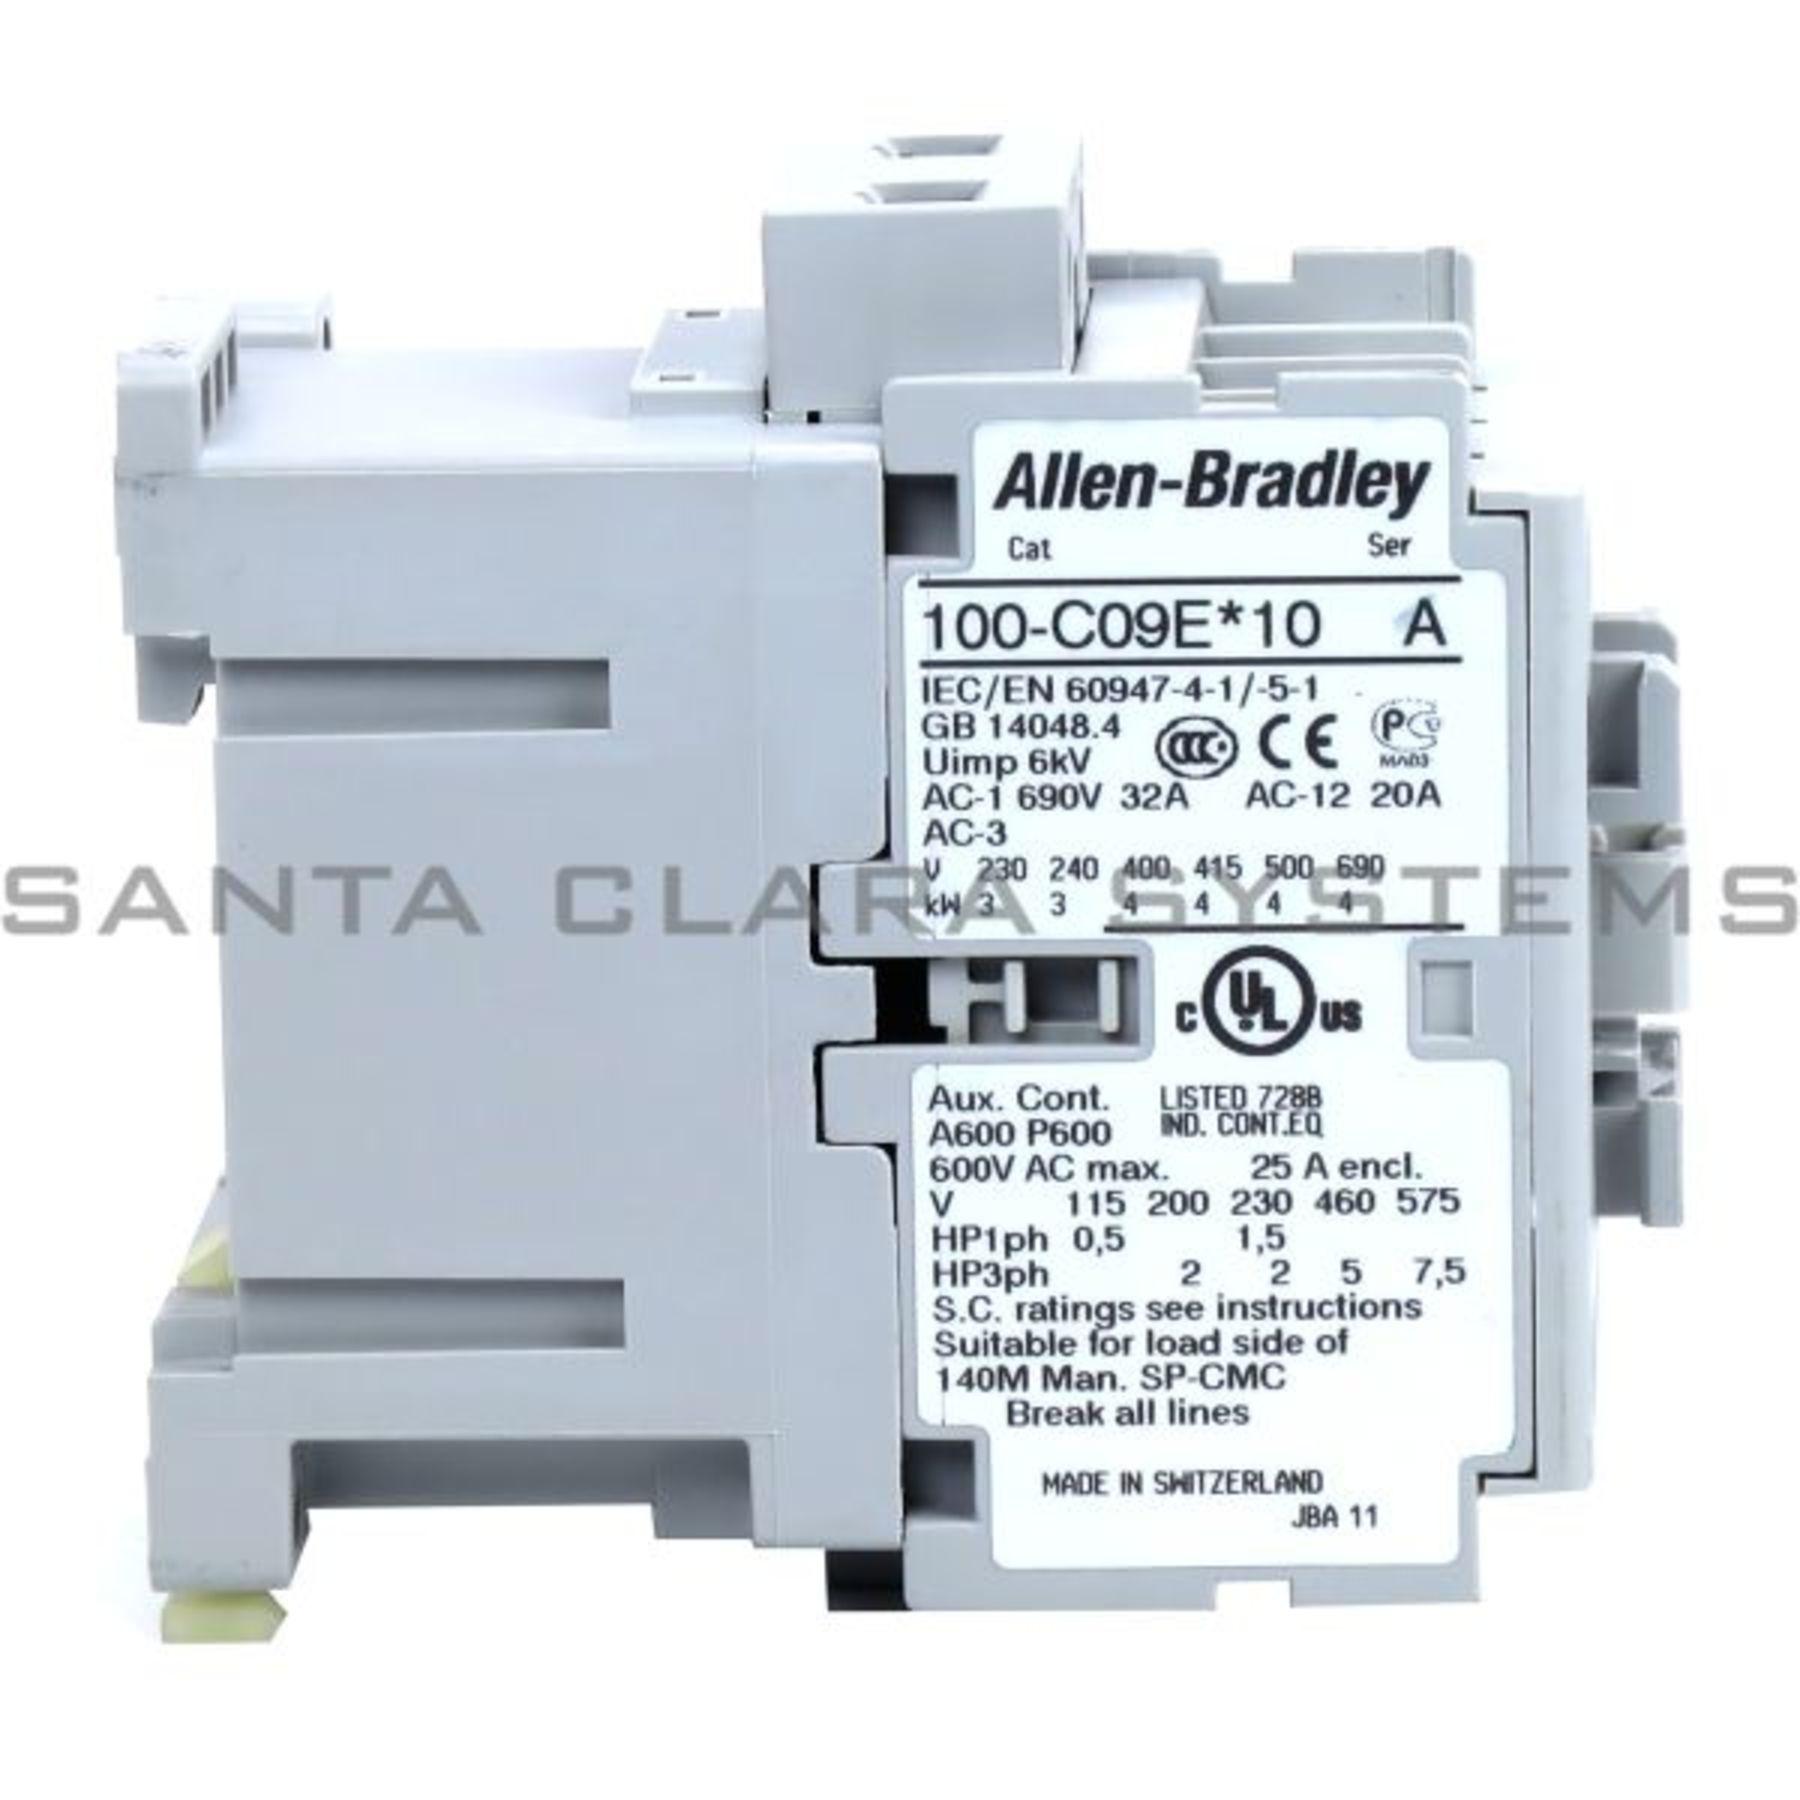 100-C09EJ10 Allen Bradley In stock and ready to ship - Santa Clara ...